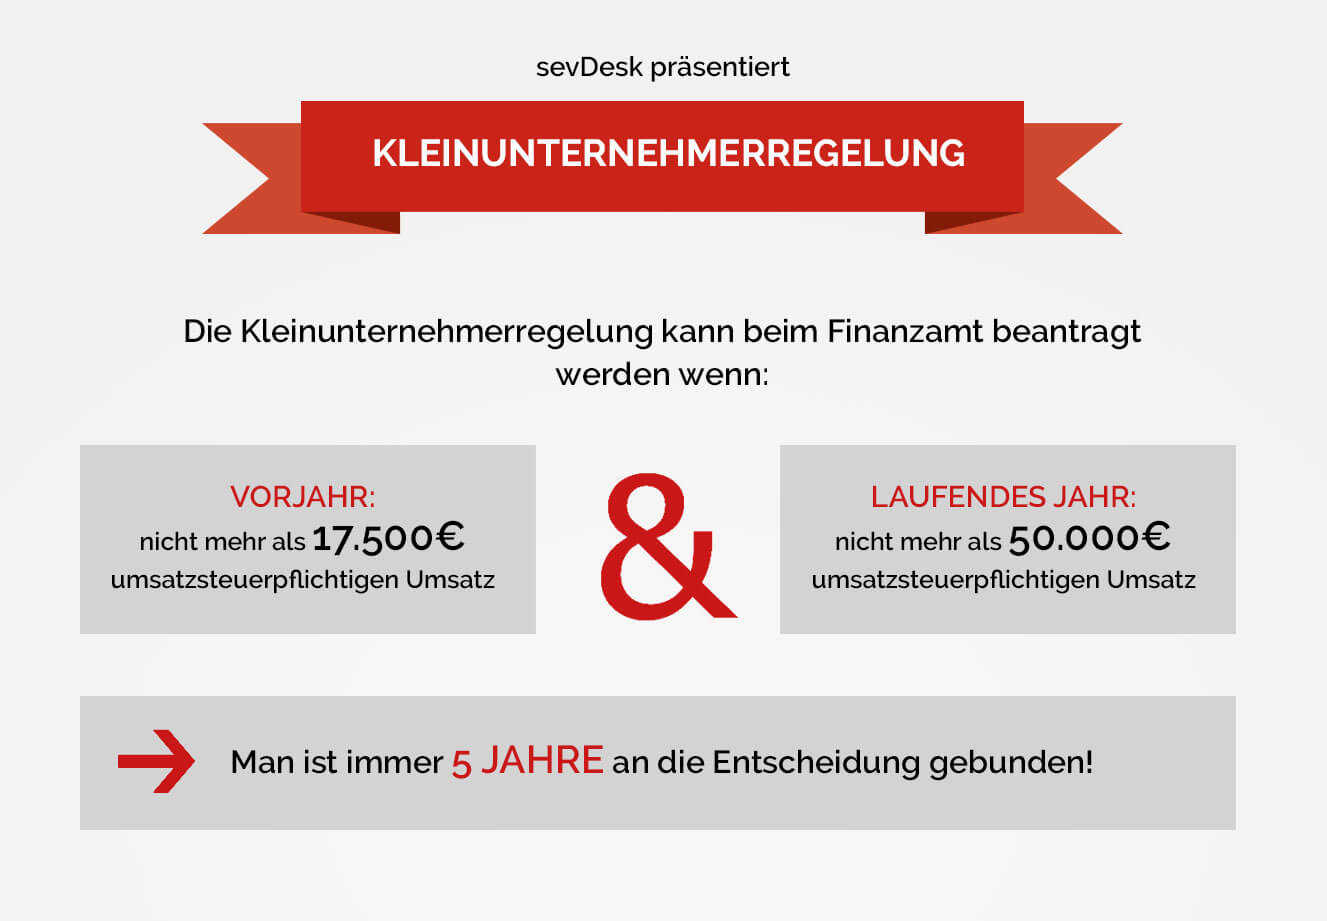 Kleinunternehmerregelung Infografik